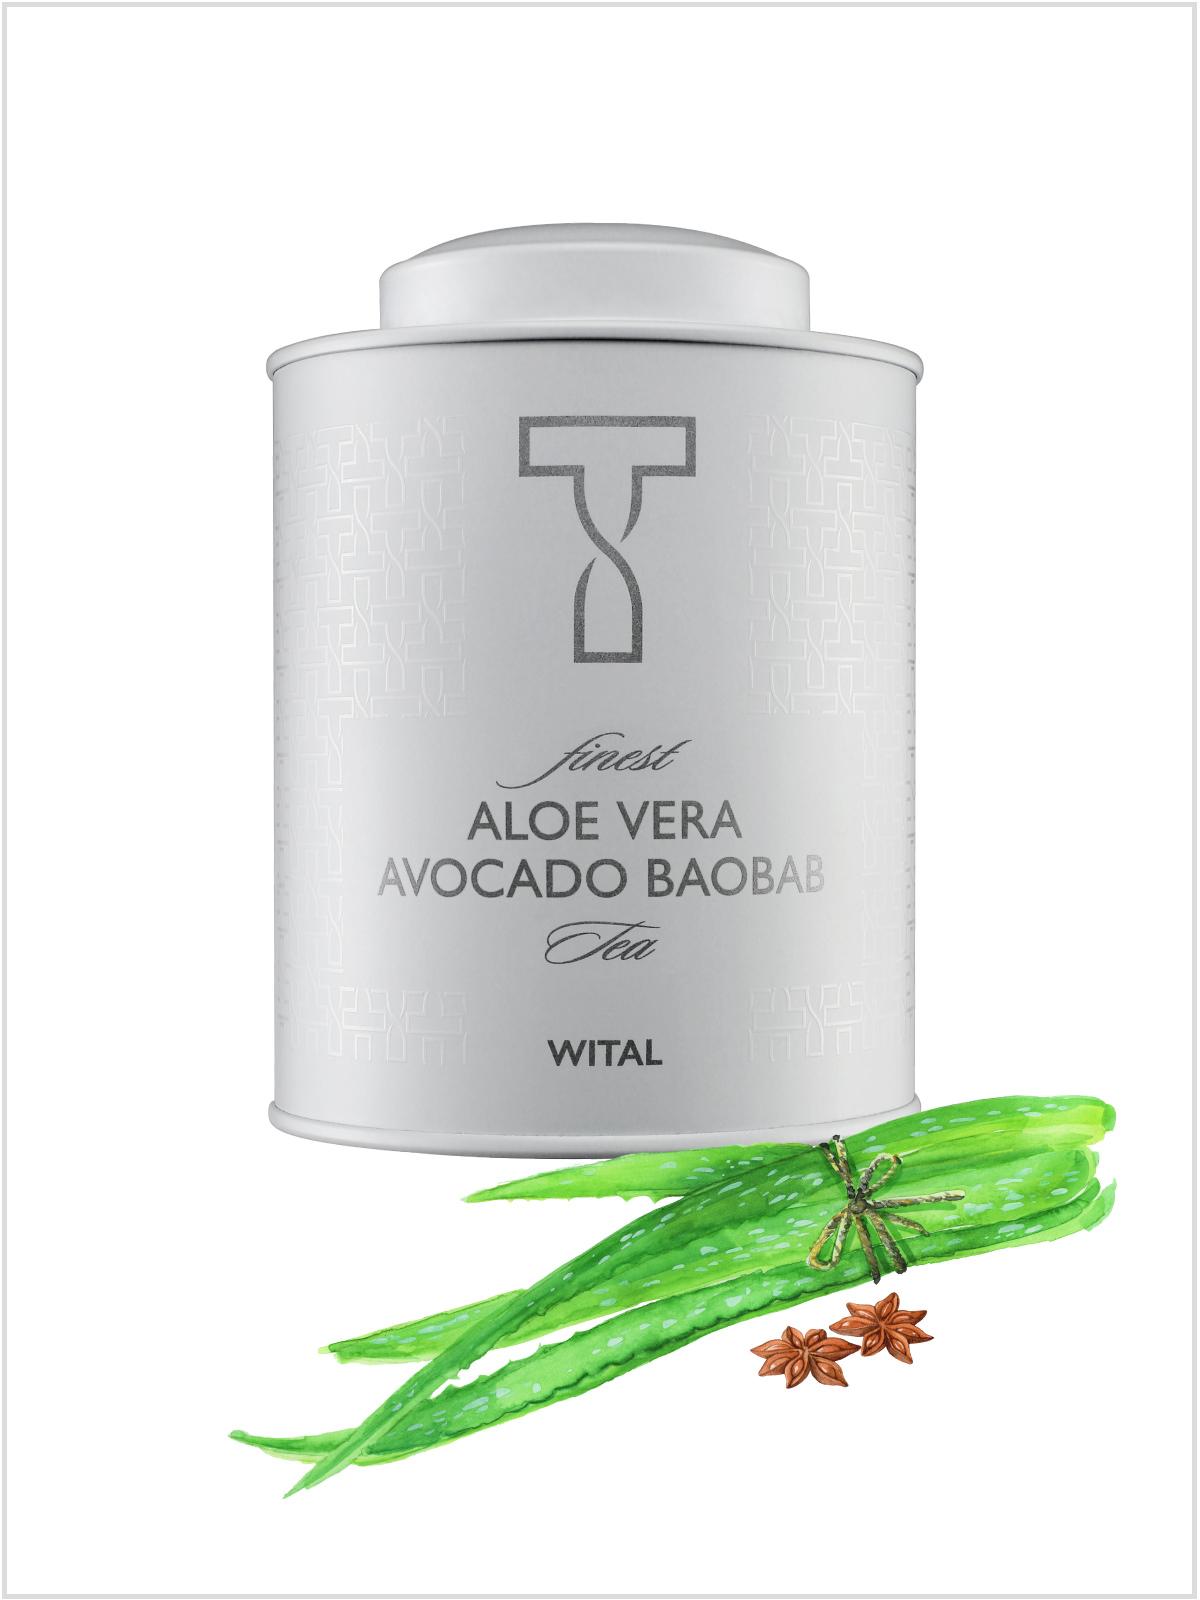 frederickandsophie-gourmet-wital-aloevera-baobab-avocado-tea